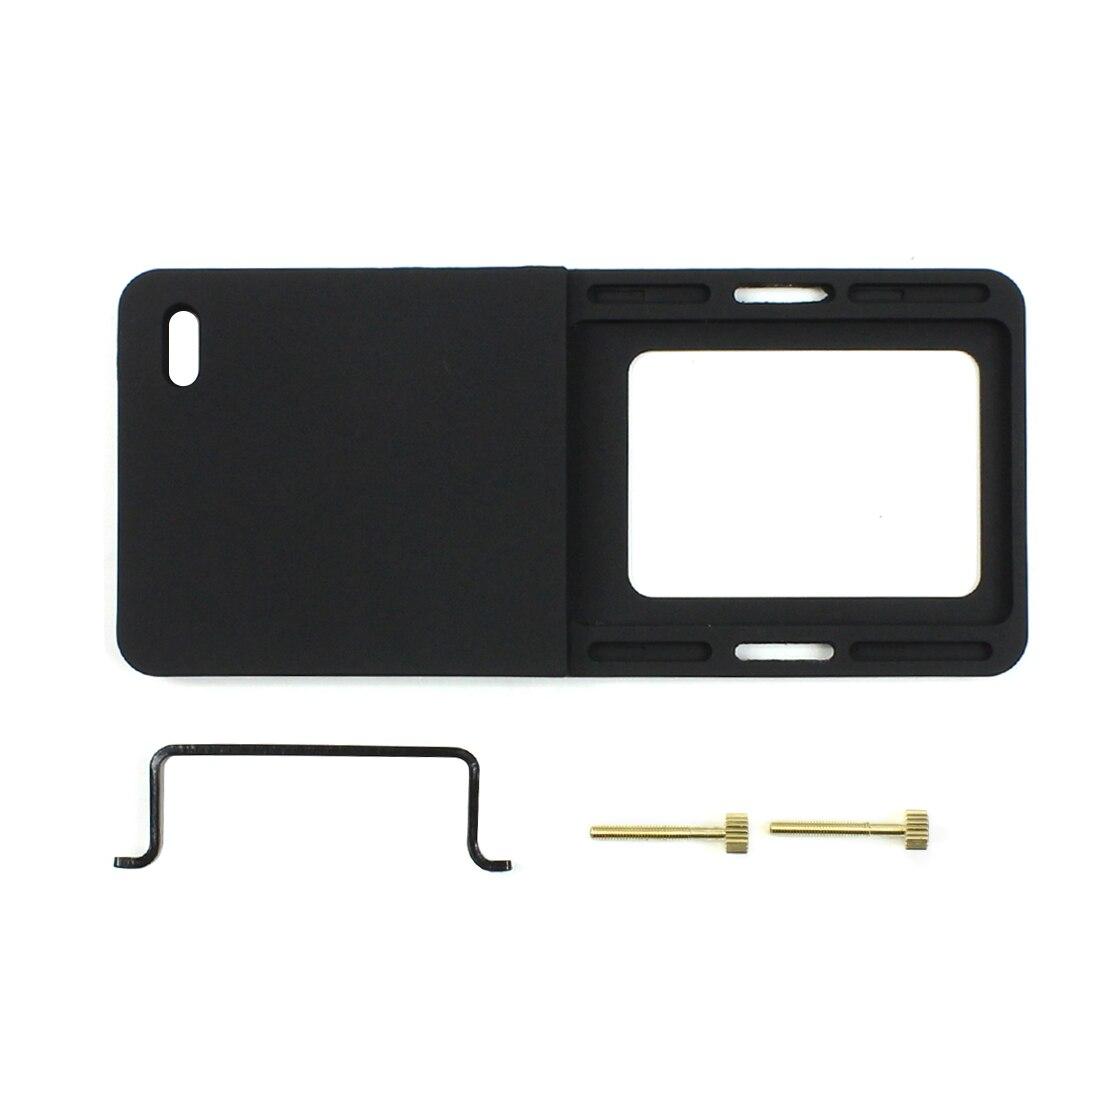 BGNING Handheld Gimbal Adapter Switch Mount Plate For GoPro Hero 7 6 5 3 3+ 4 Yi 4k Camera For DJI Osmo Zhiyun Smooth Q Mobile